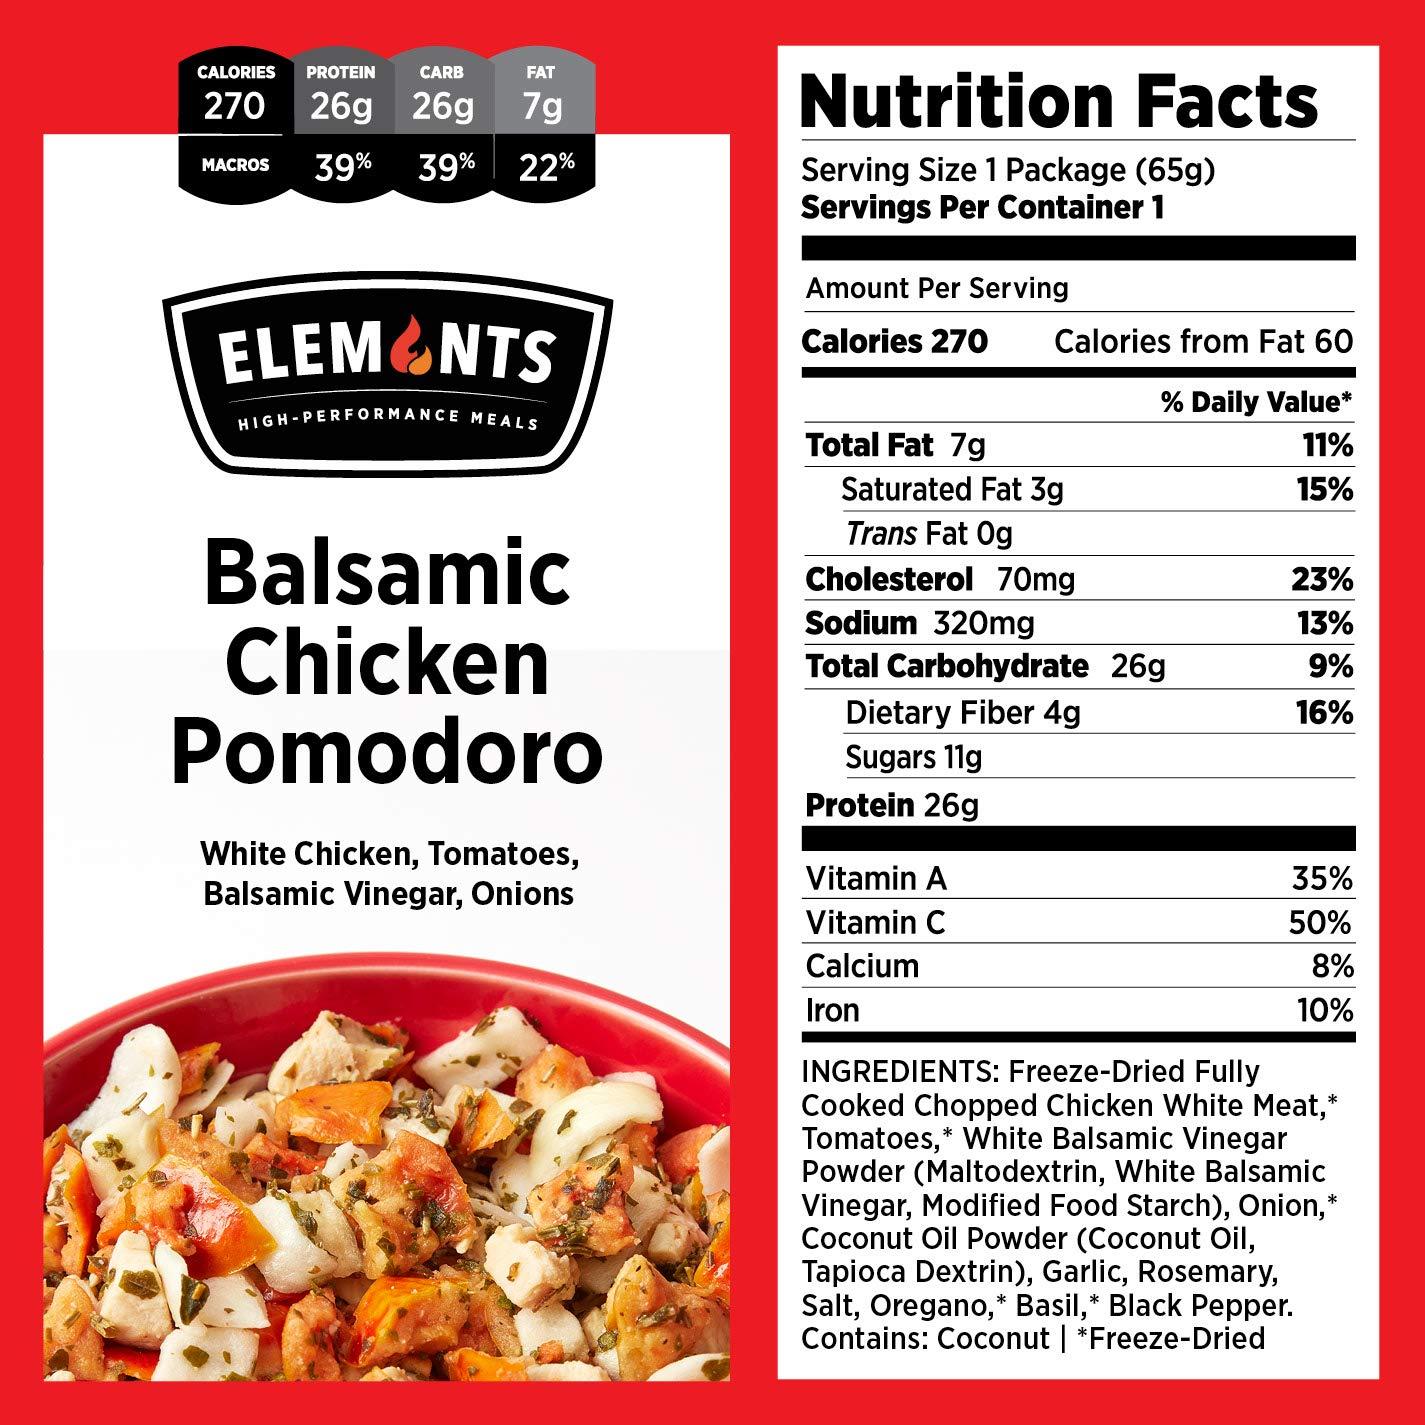 Elements Food, 10-Pack Variety Kit, Balsamic Chicken Pomodoro, Chipotle Turkey Scaramble, Maple Mustard Pork, Broccoli Cinnamon Pork, Sesame Garlic Chicken, Healthy Freeze Dried Food, Paleo Meals by Elements Food (Image #5)